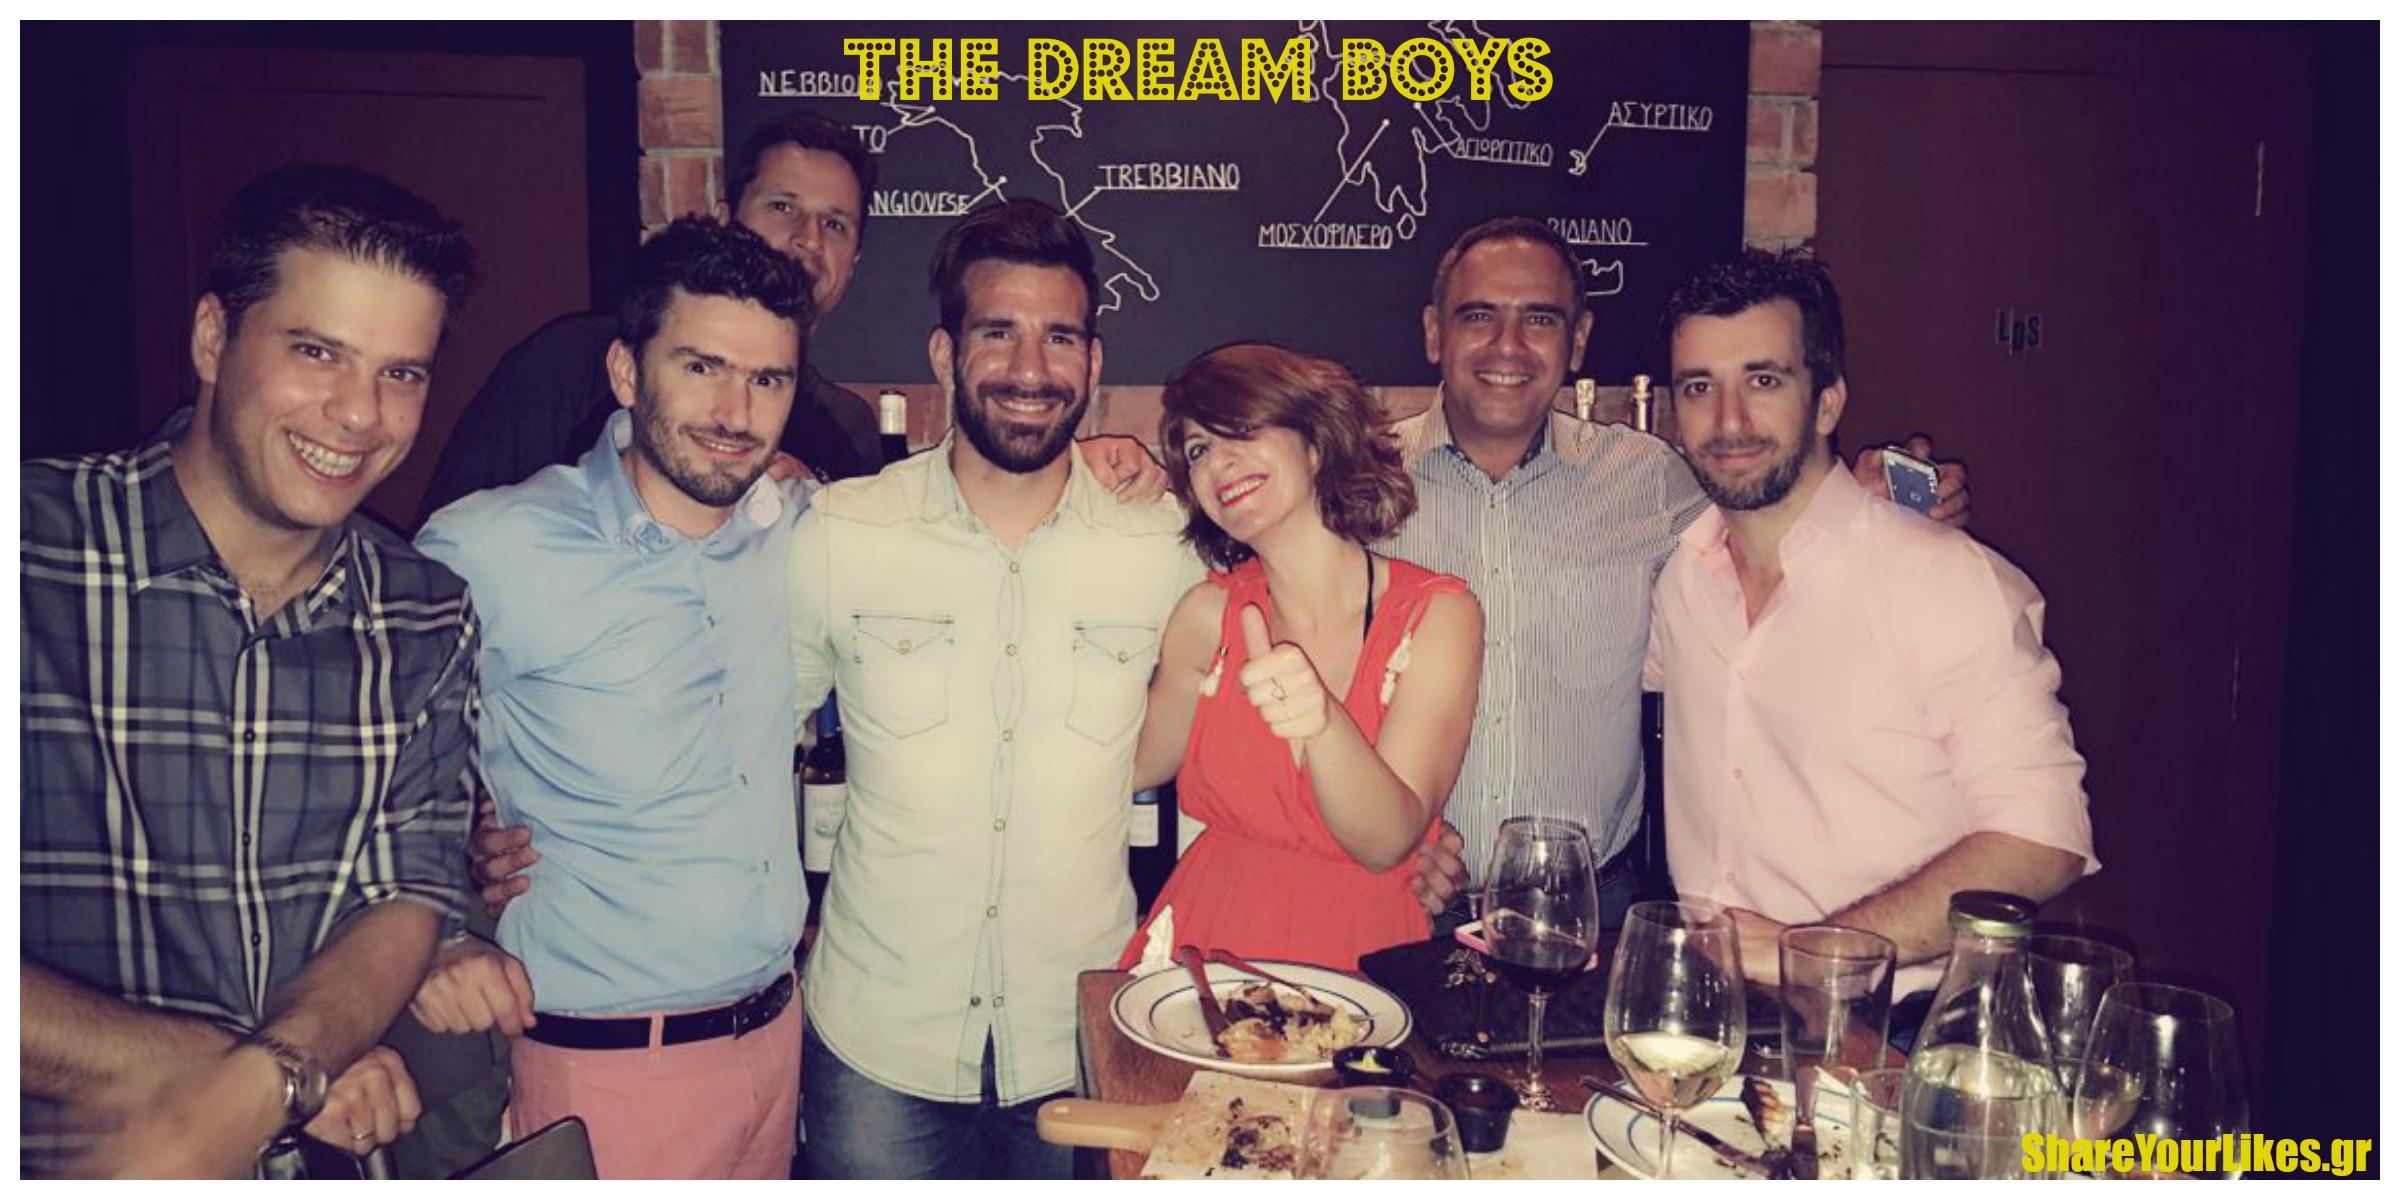 dream boys Collage